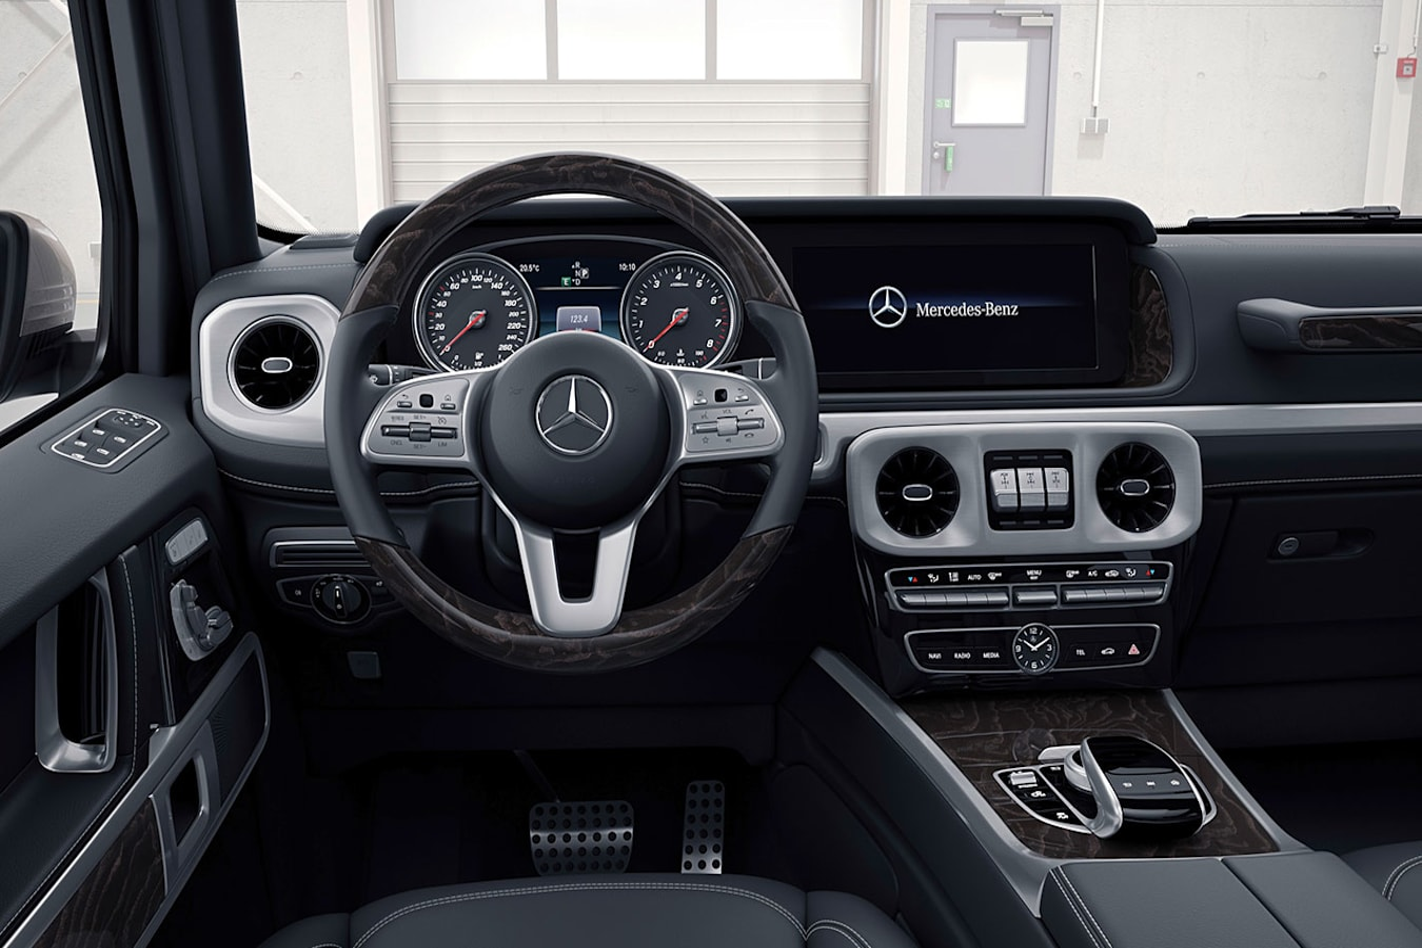 G-Class interior